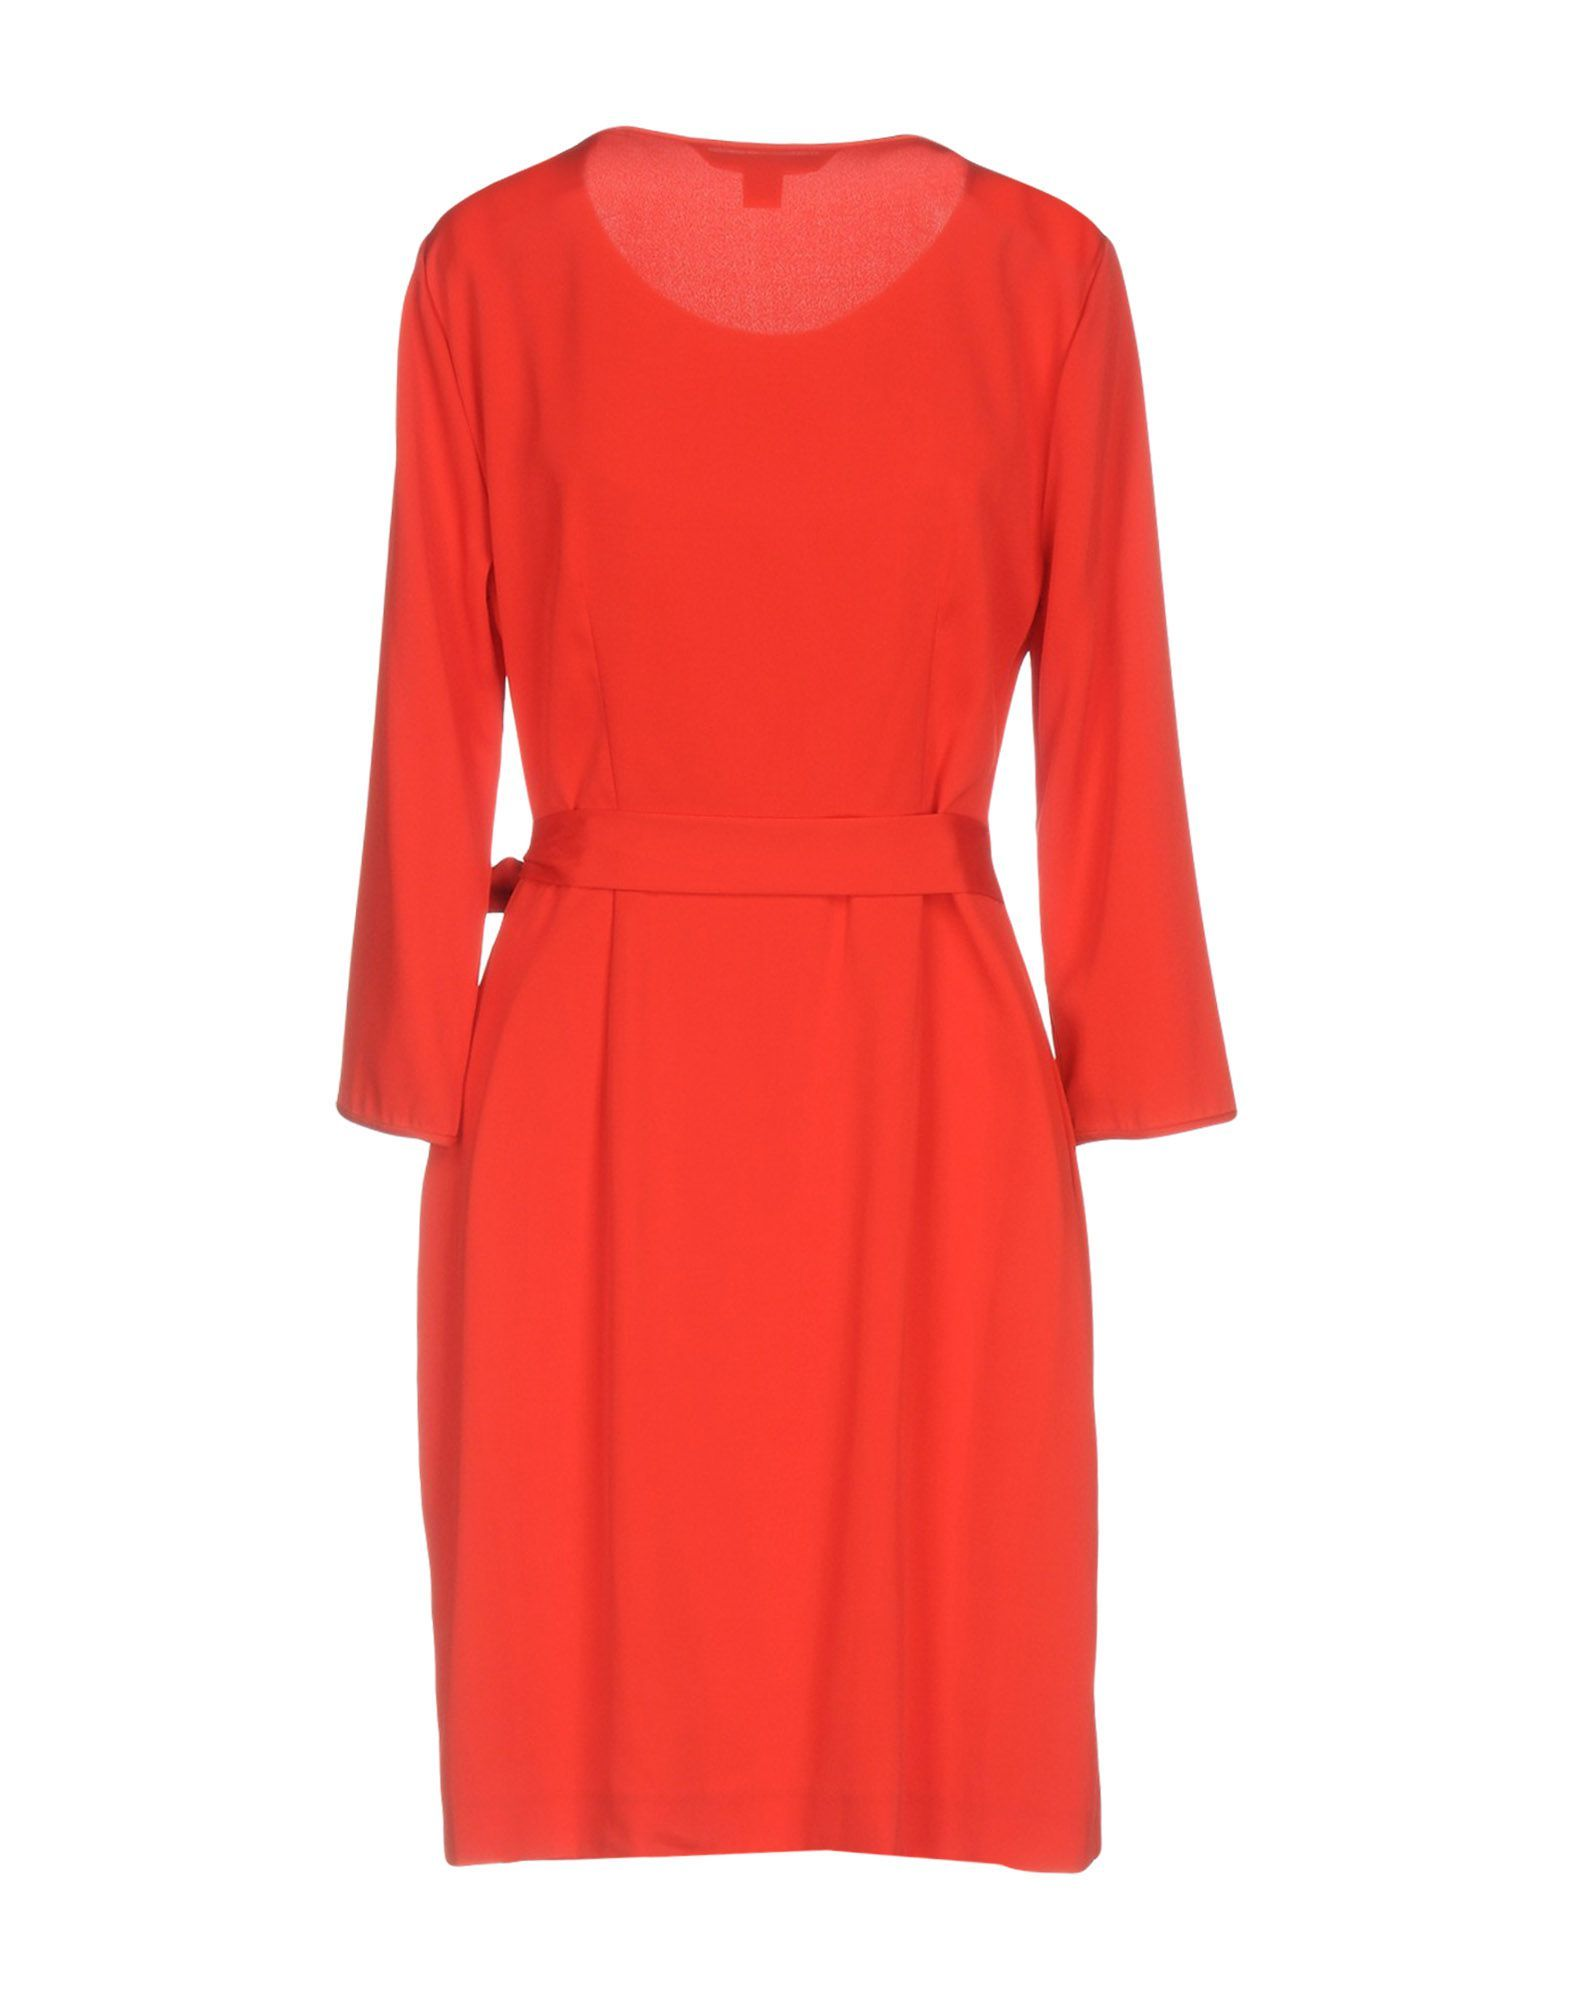 Diane Von Furstenberg Red Silk Draped Long Sleeve Dress